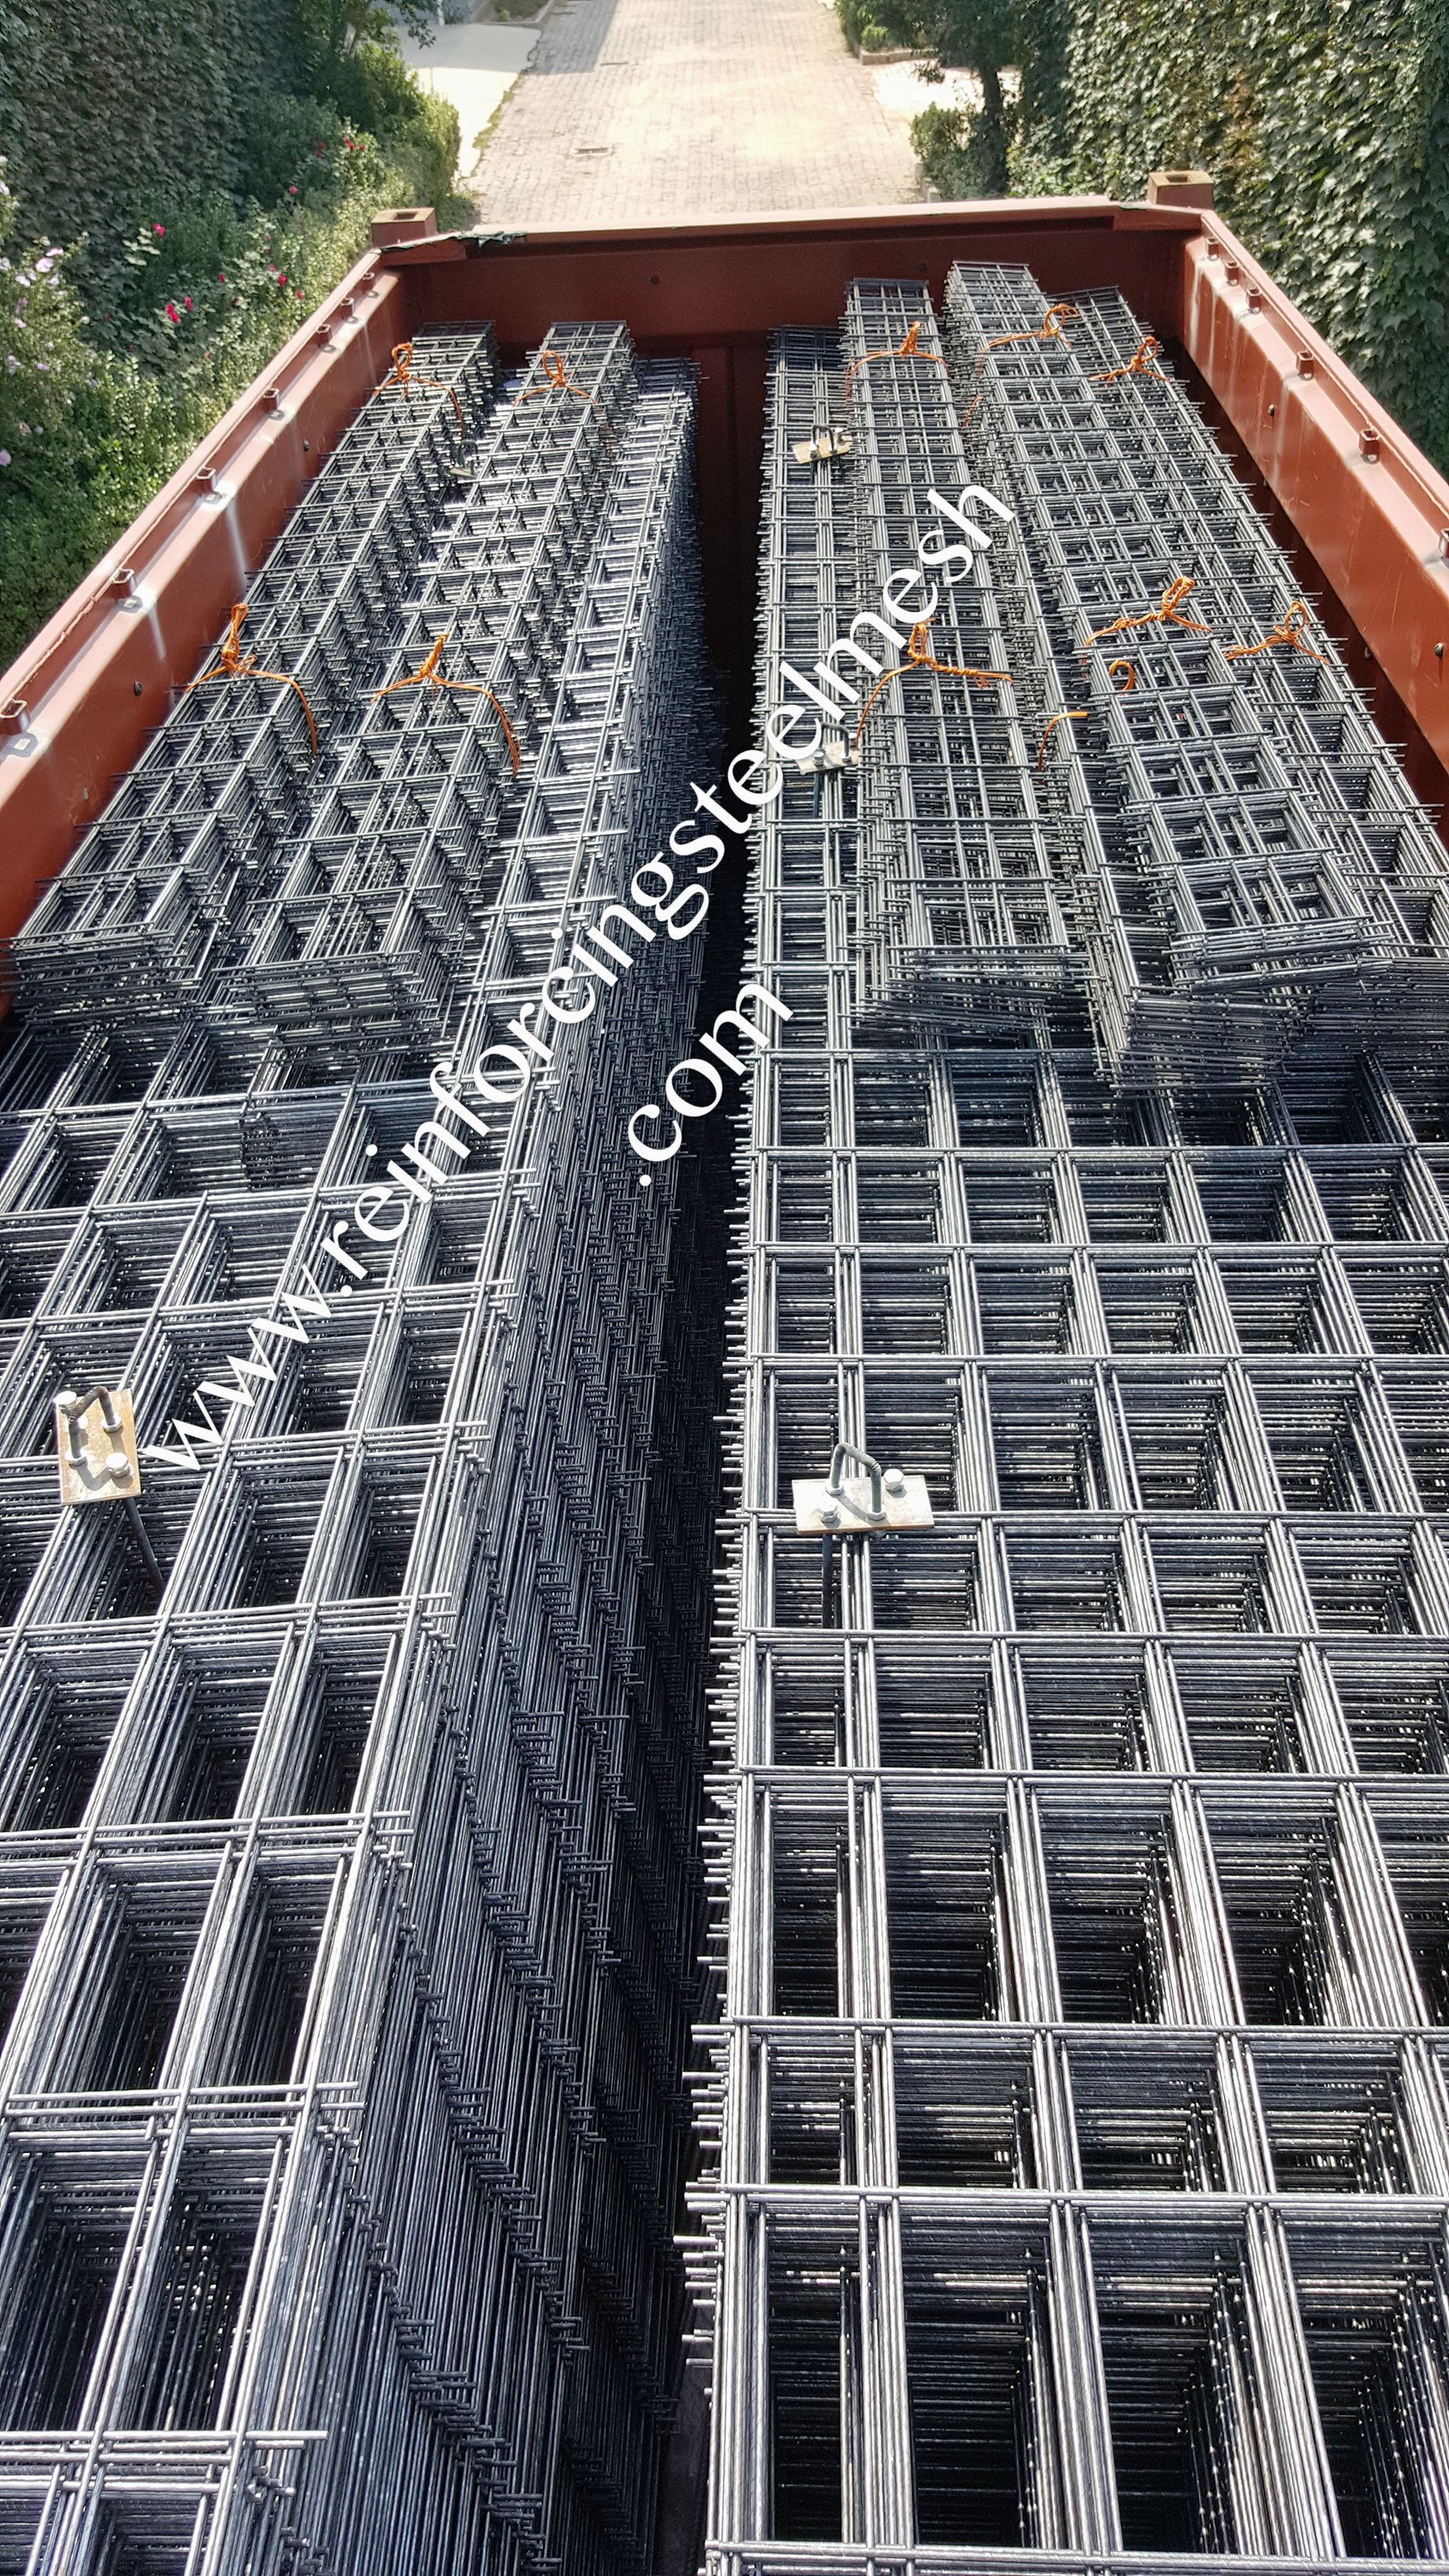 reinforcing mesh welded wire mesh   welded wire mesh   Pinterest ...